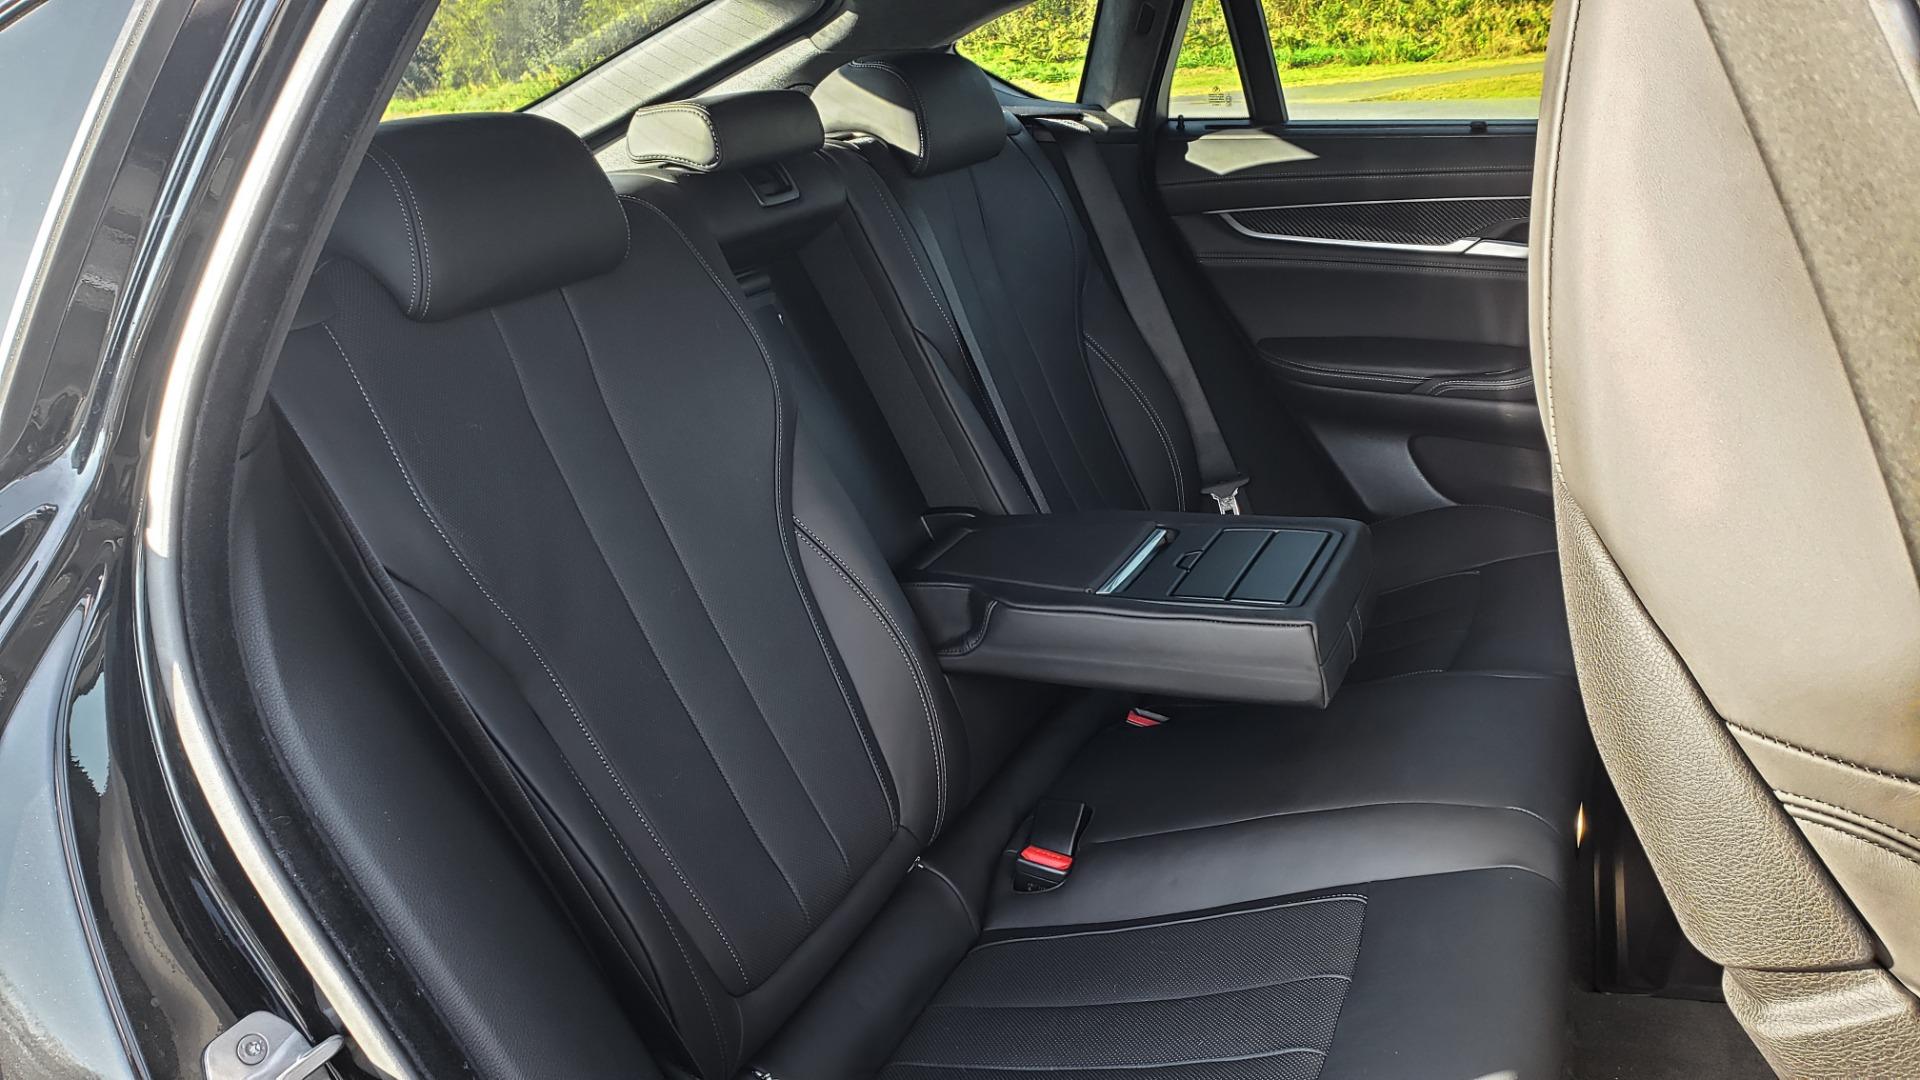 Used 2016 BMW X6 M EXEC PKG / DRVR ASST / NAV / SUNROOF / BLIND SPOT / REARVIEW for sale Sold at Formula Imports in Charlotte NC 28227 78